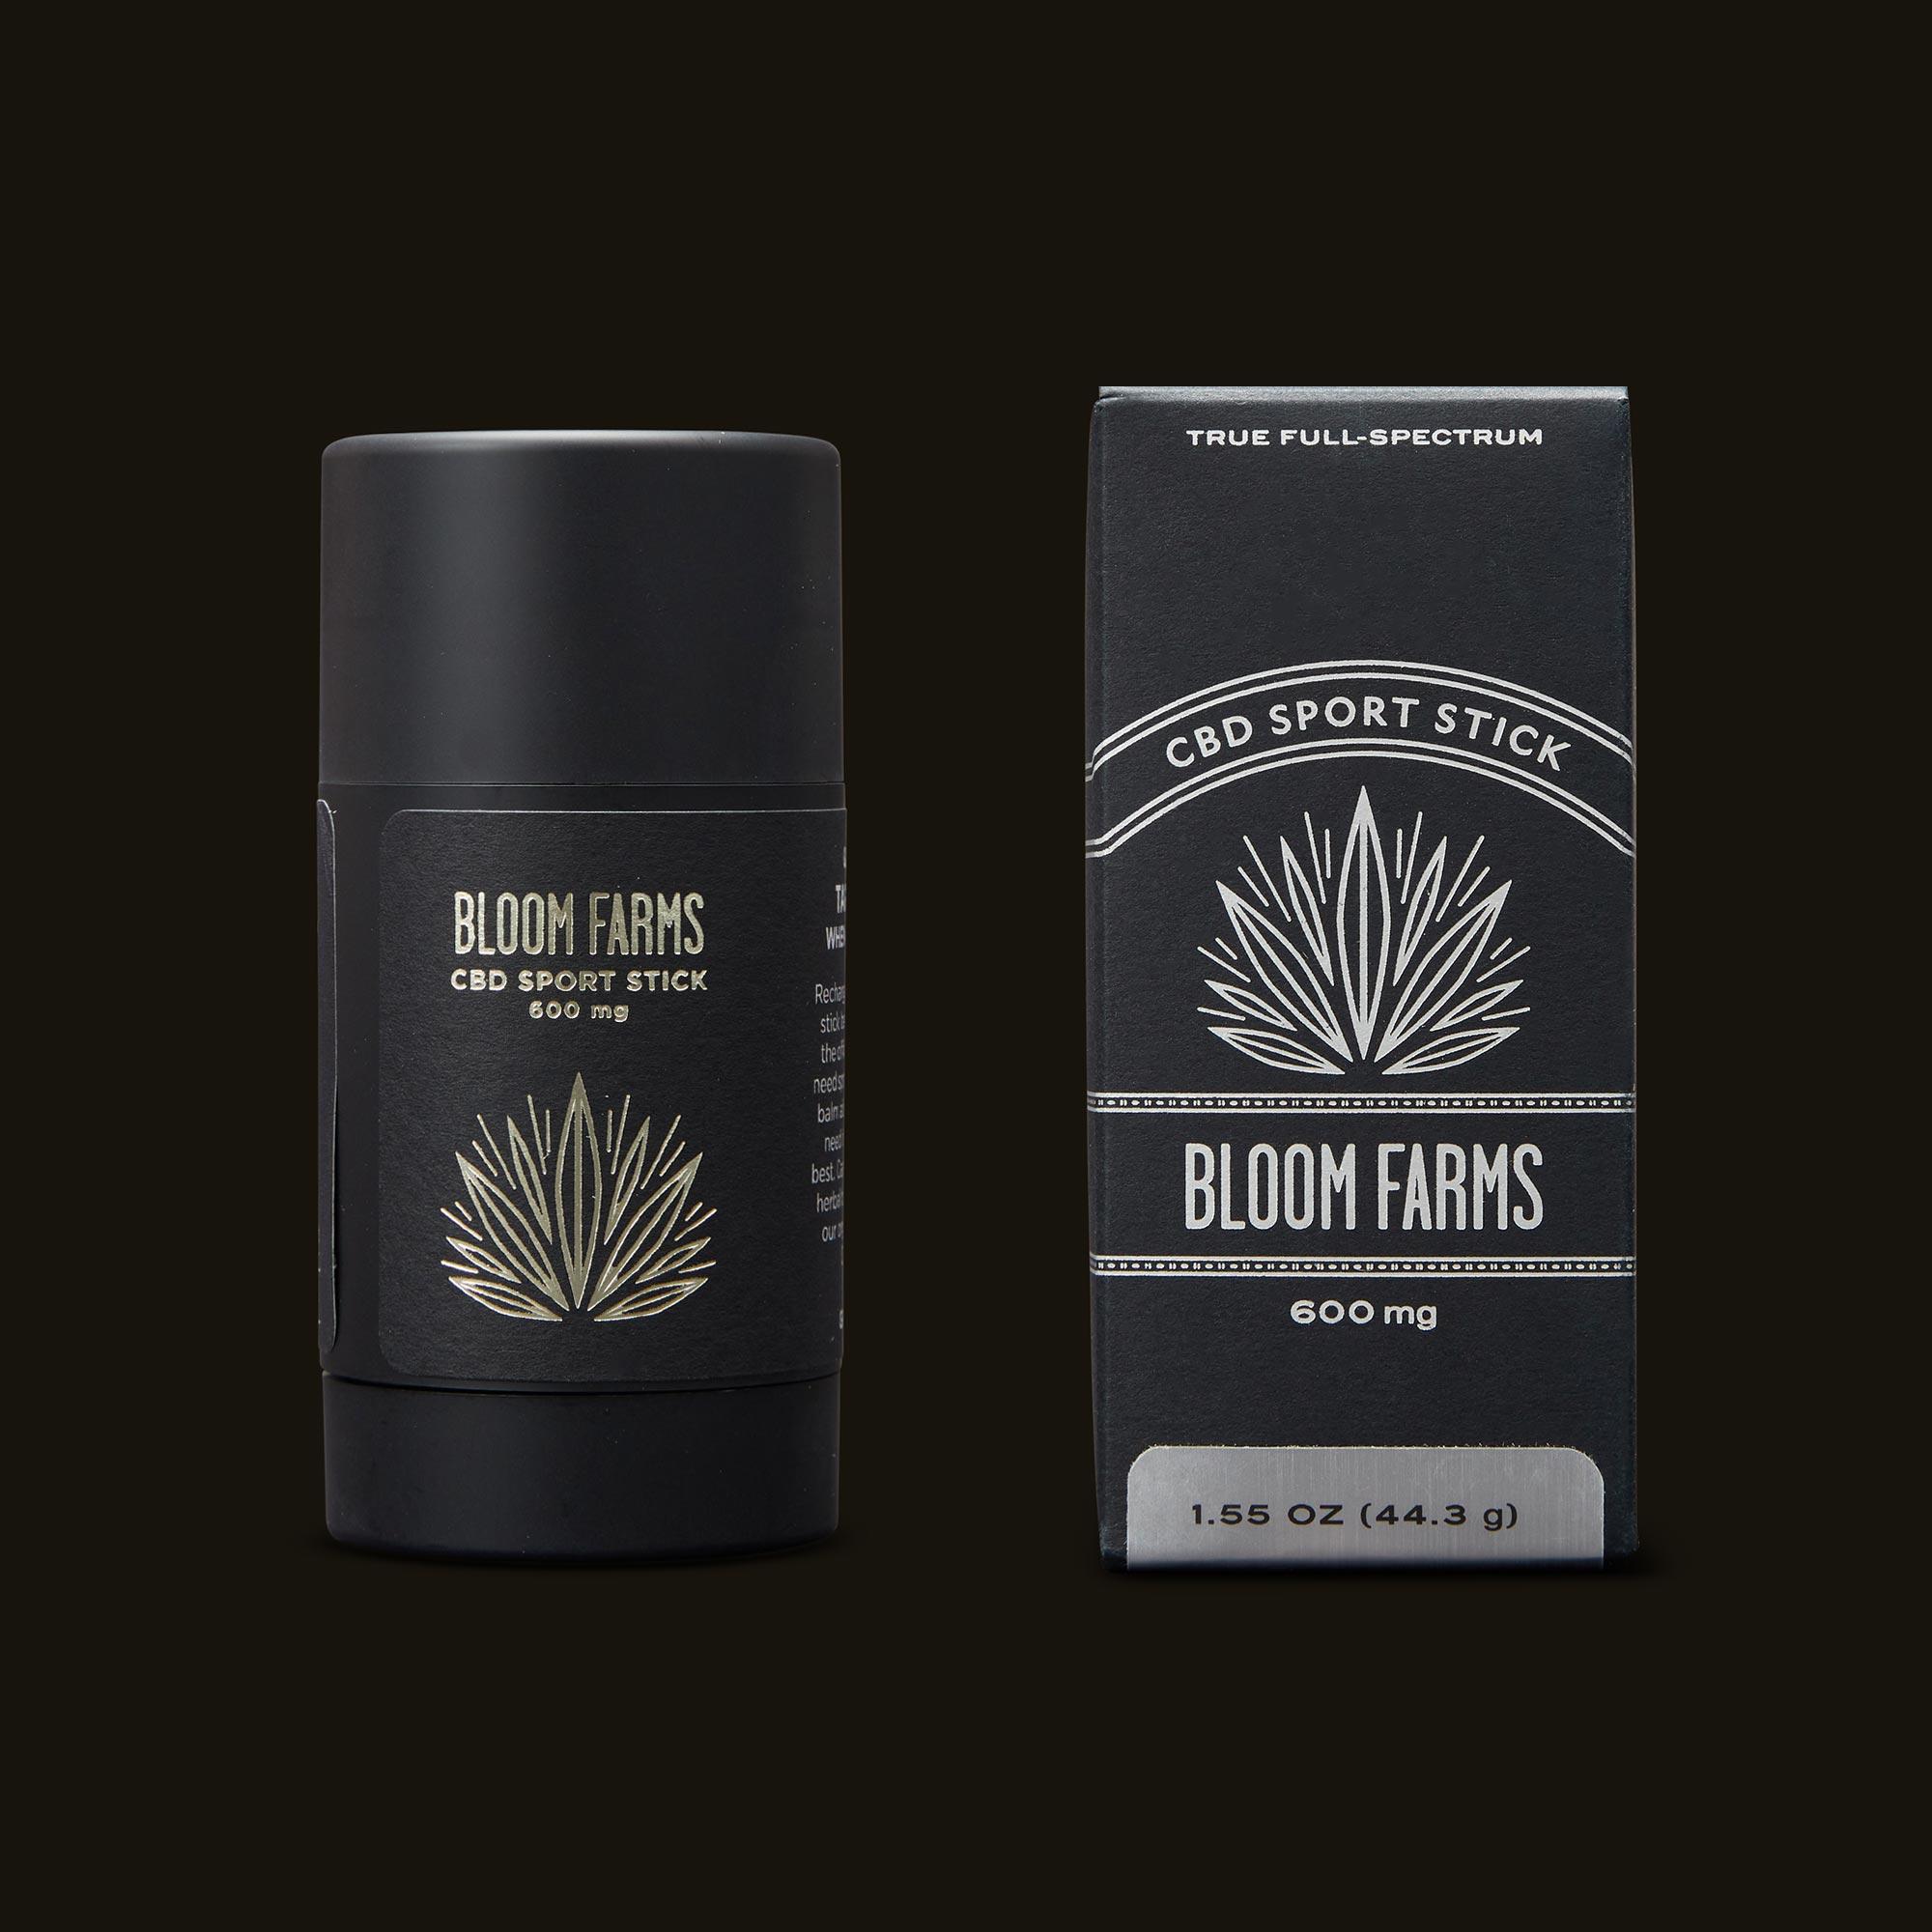 Bloom Farms CBD Sport Stick Packaging